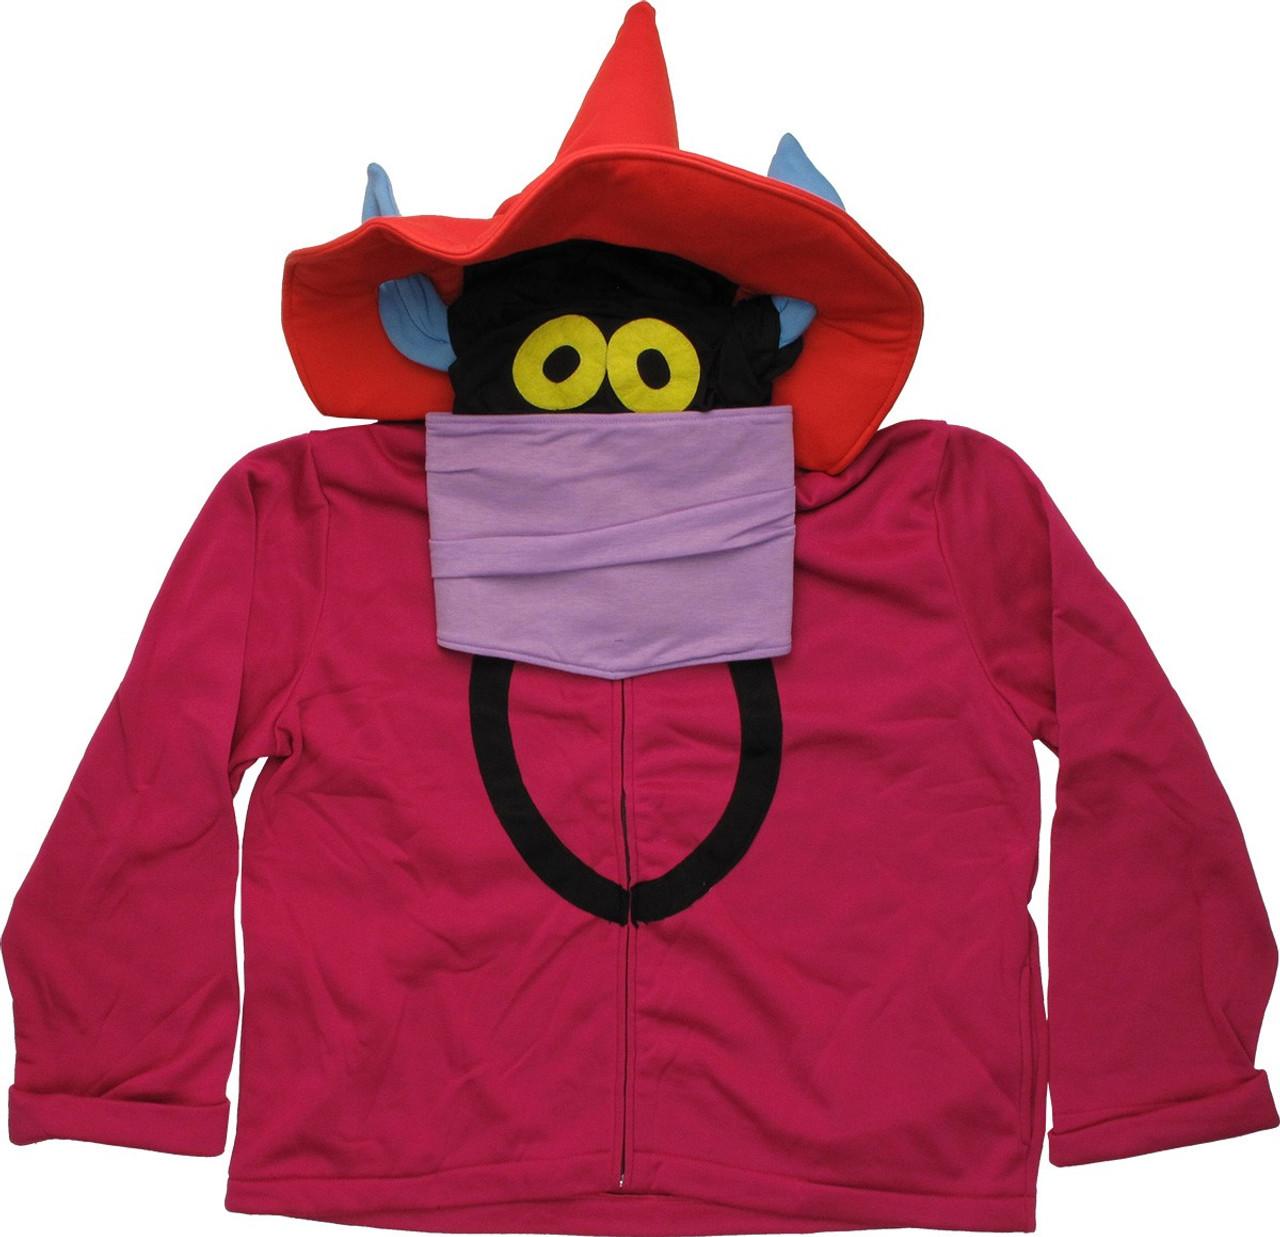 He Man Orko Costume Hoodie Shop 400 sweatshirt brands like teddy fresh, thrasher, primitive, danny duncan, champion, and santa cruz. he man orko costume hoodie